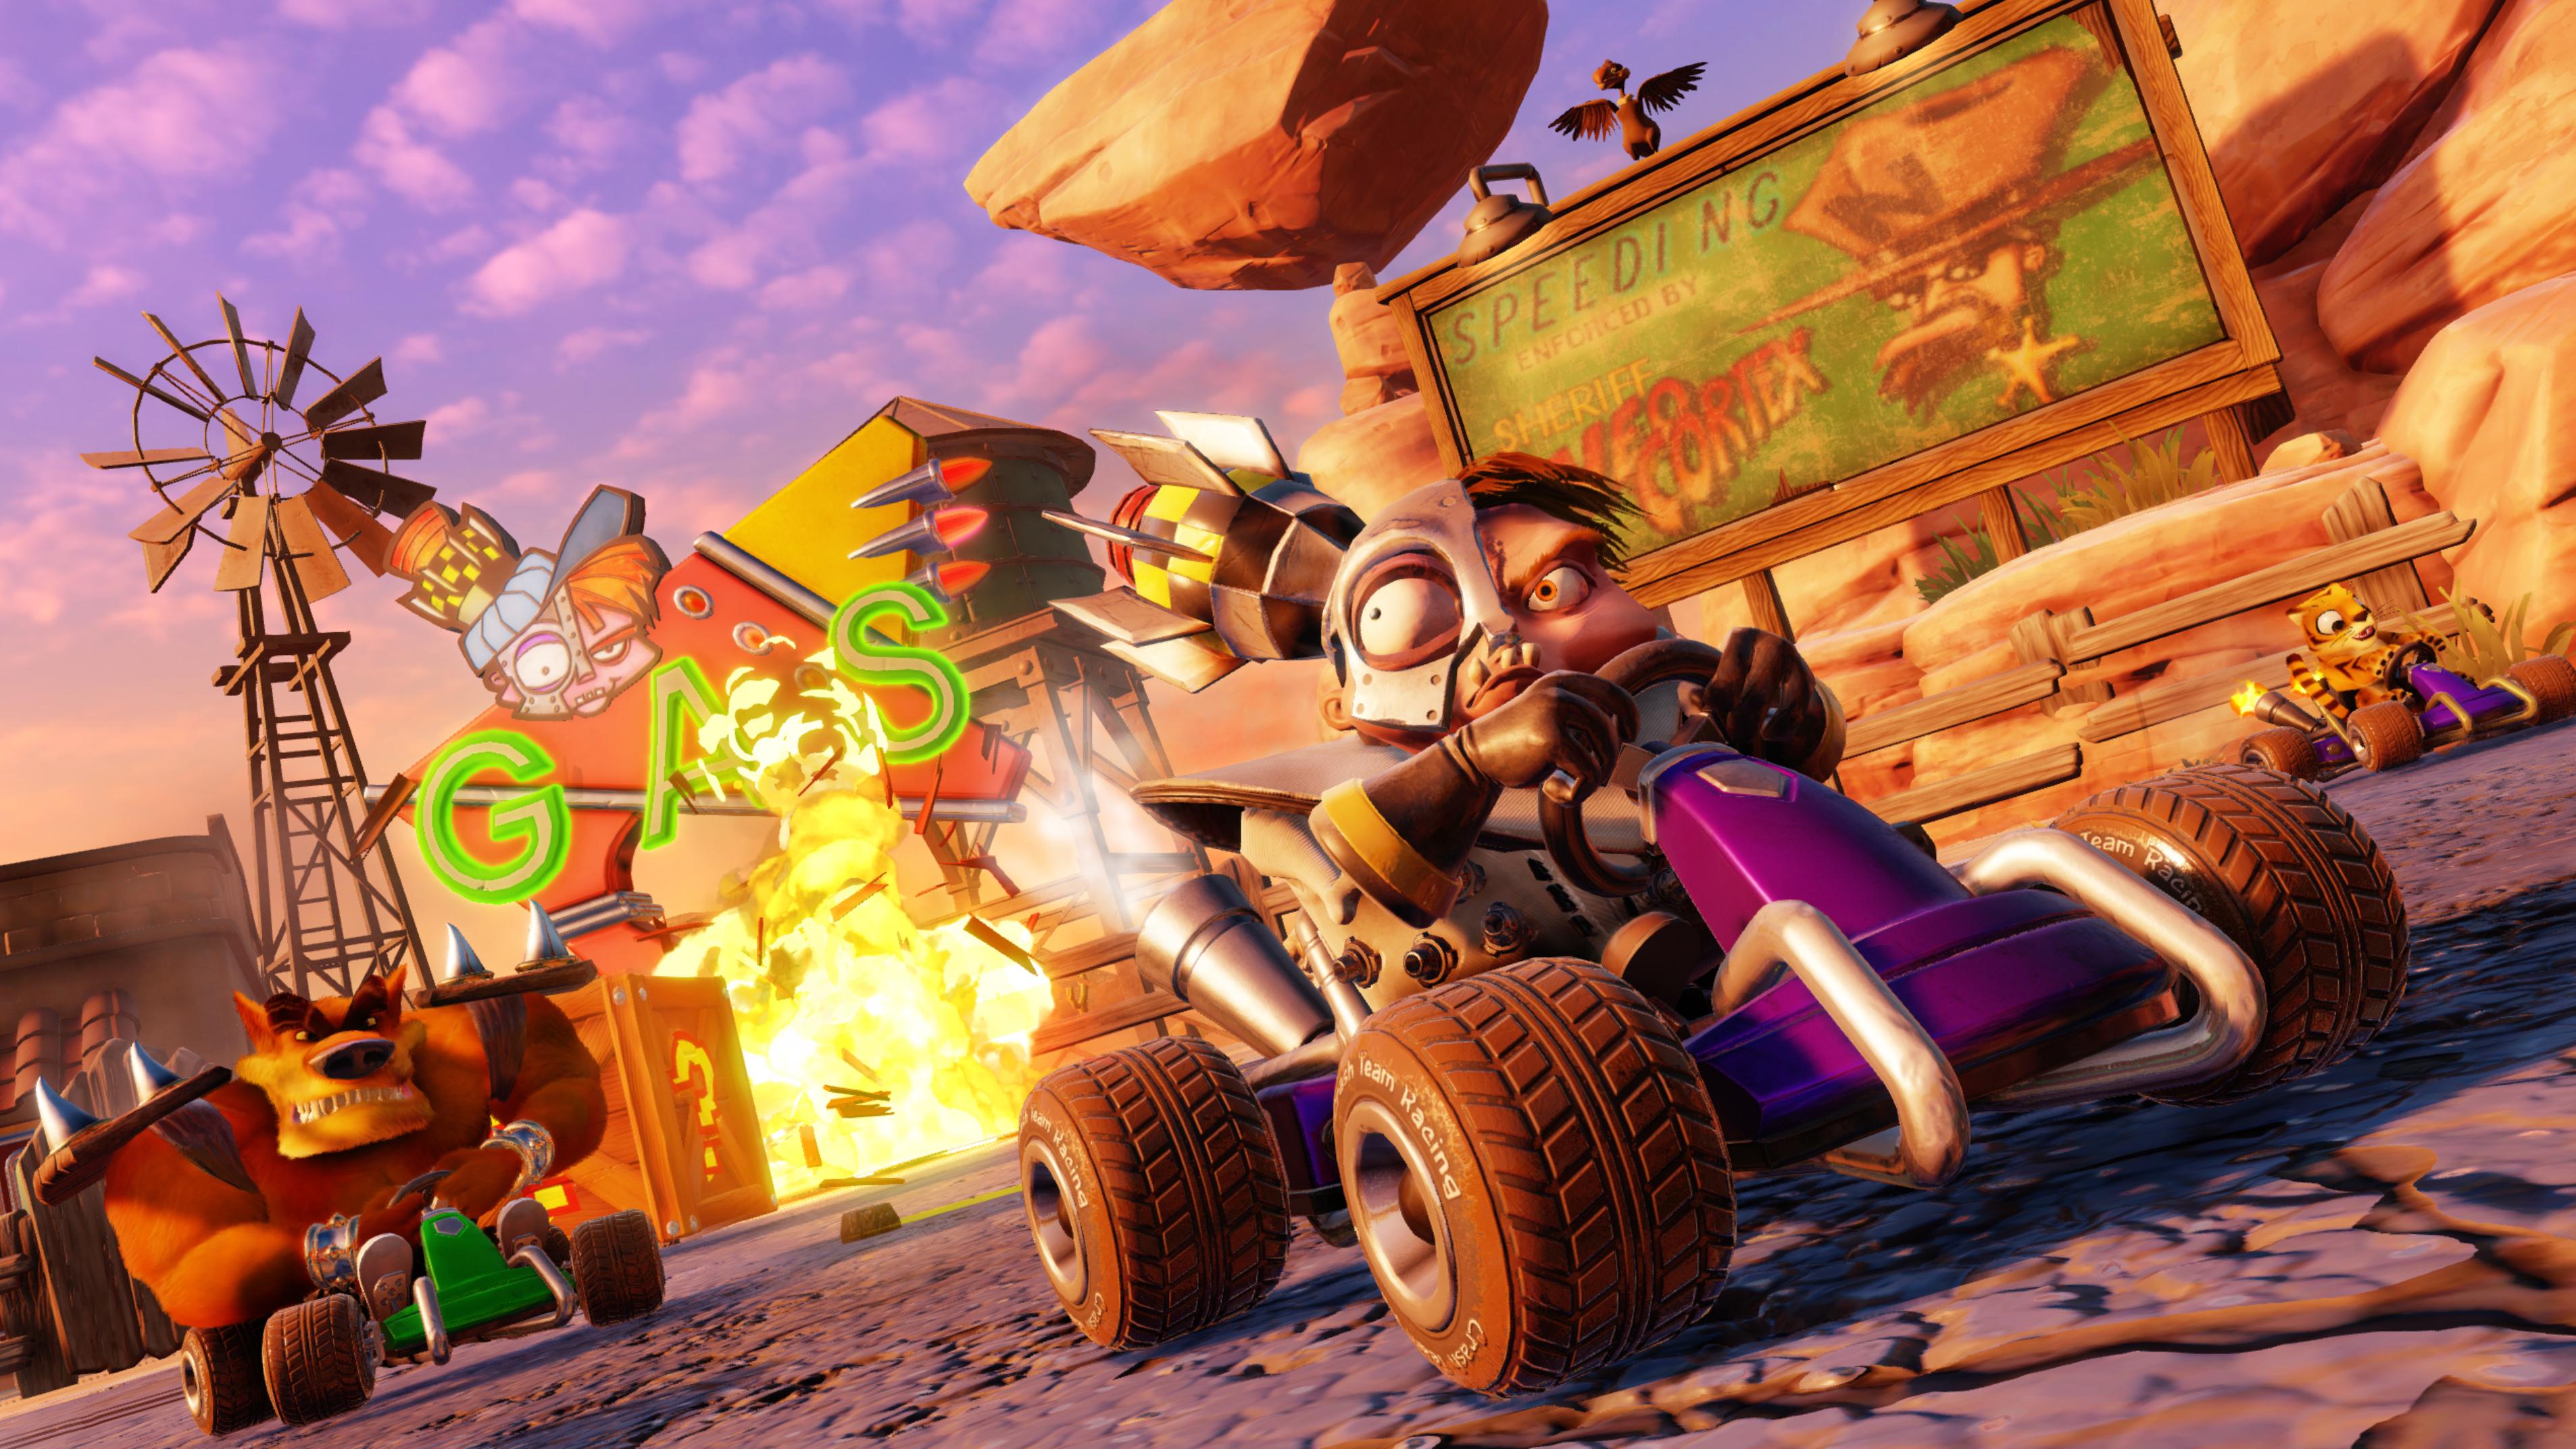 Crash Team Racing: Nitro-Fueled is a ridiculously fun ride down memory lane